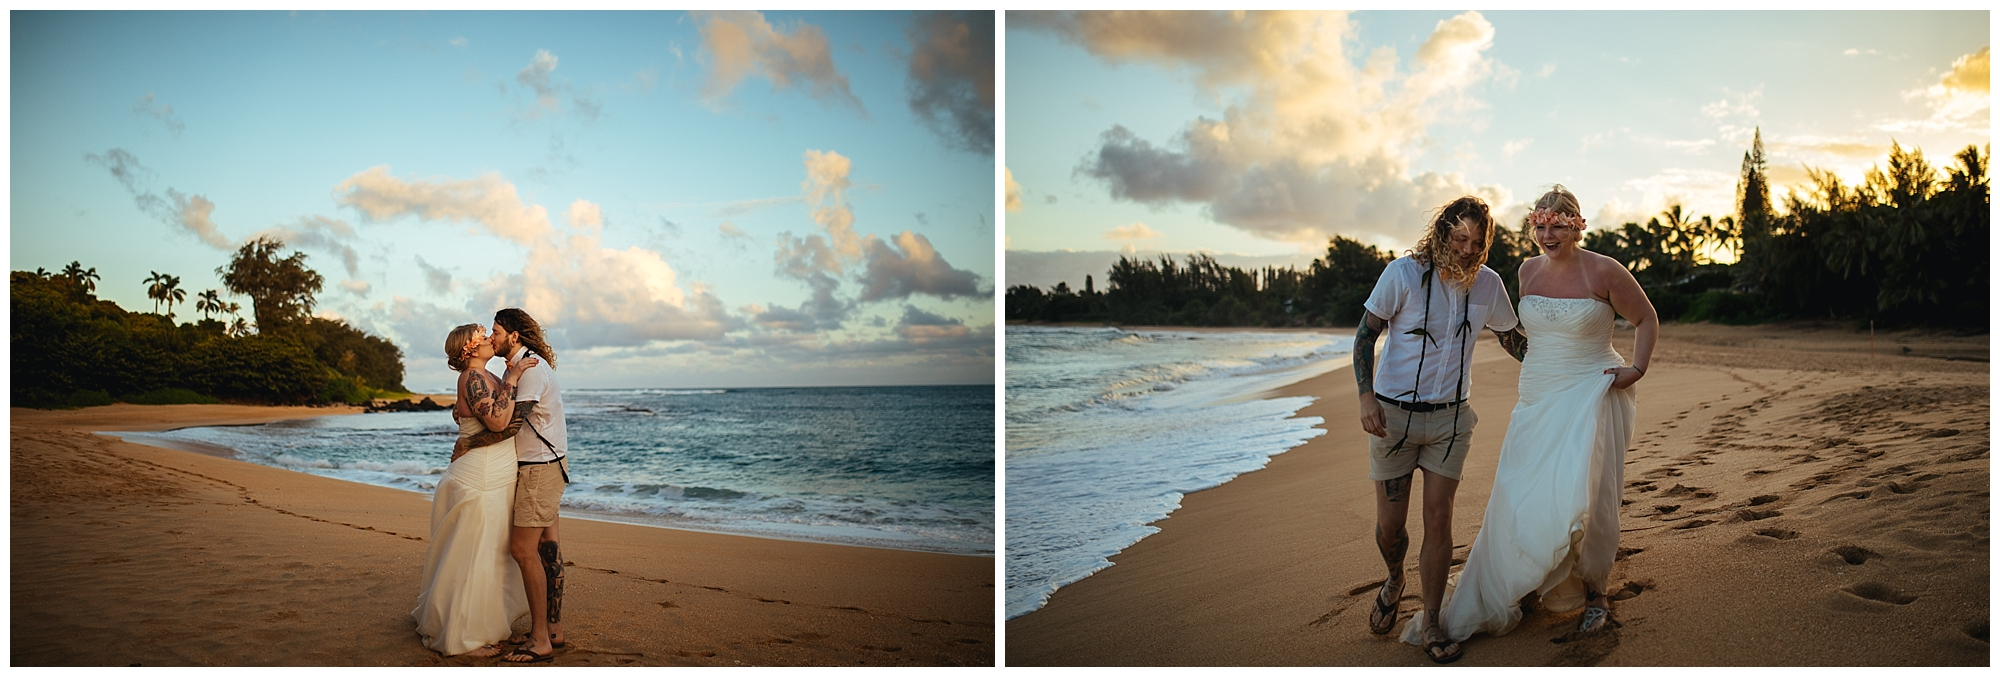 Kauai-Wedding_0024.jpg